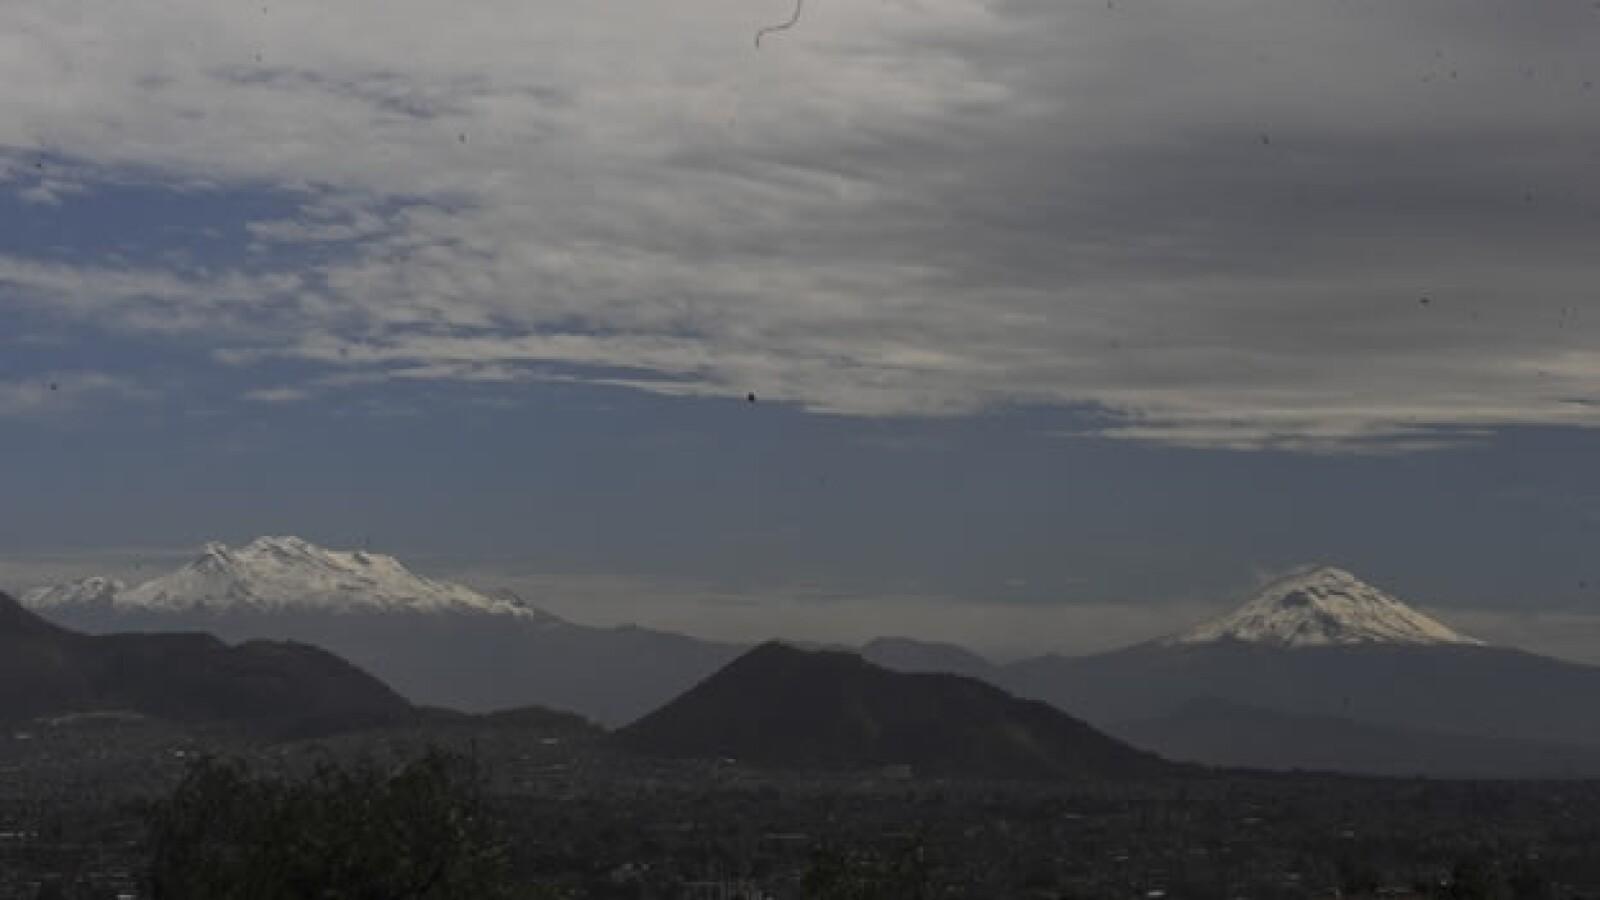 Imagen del volcan Popocatepetl